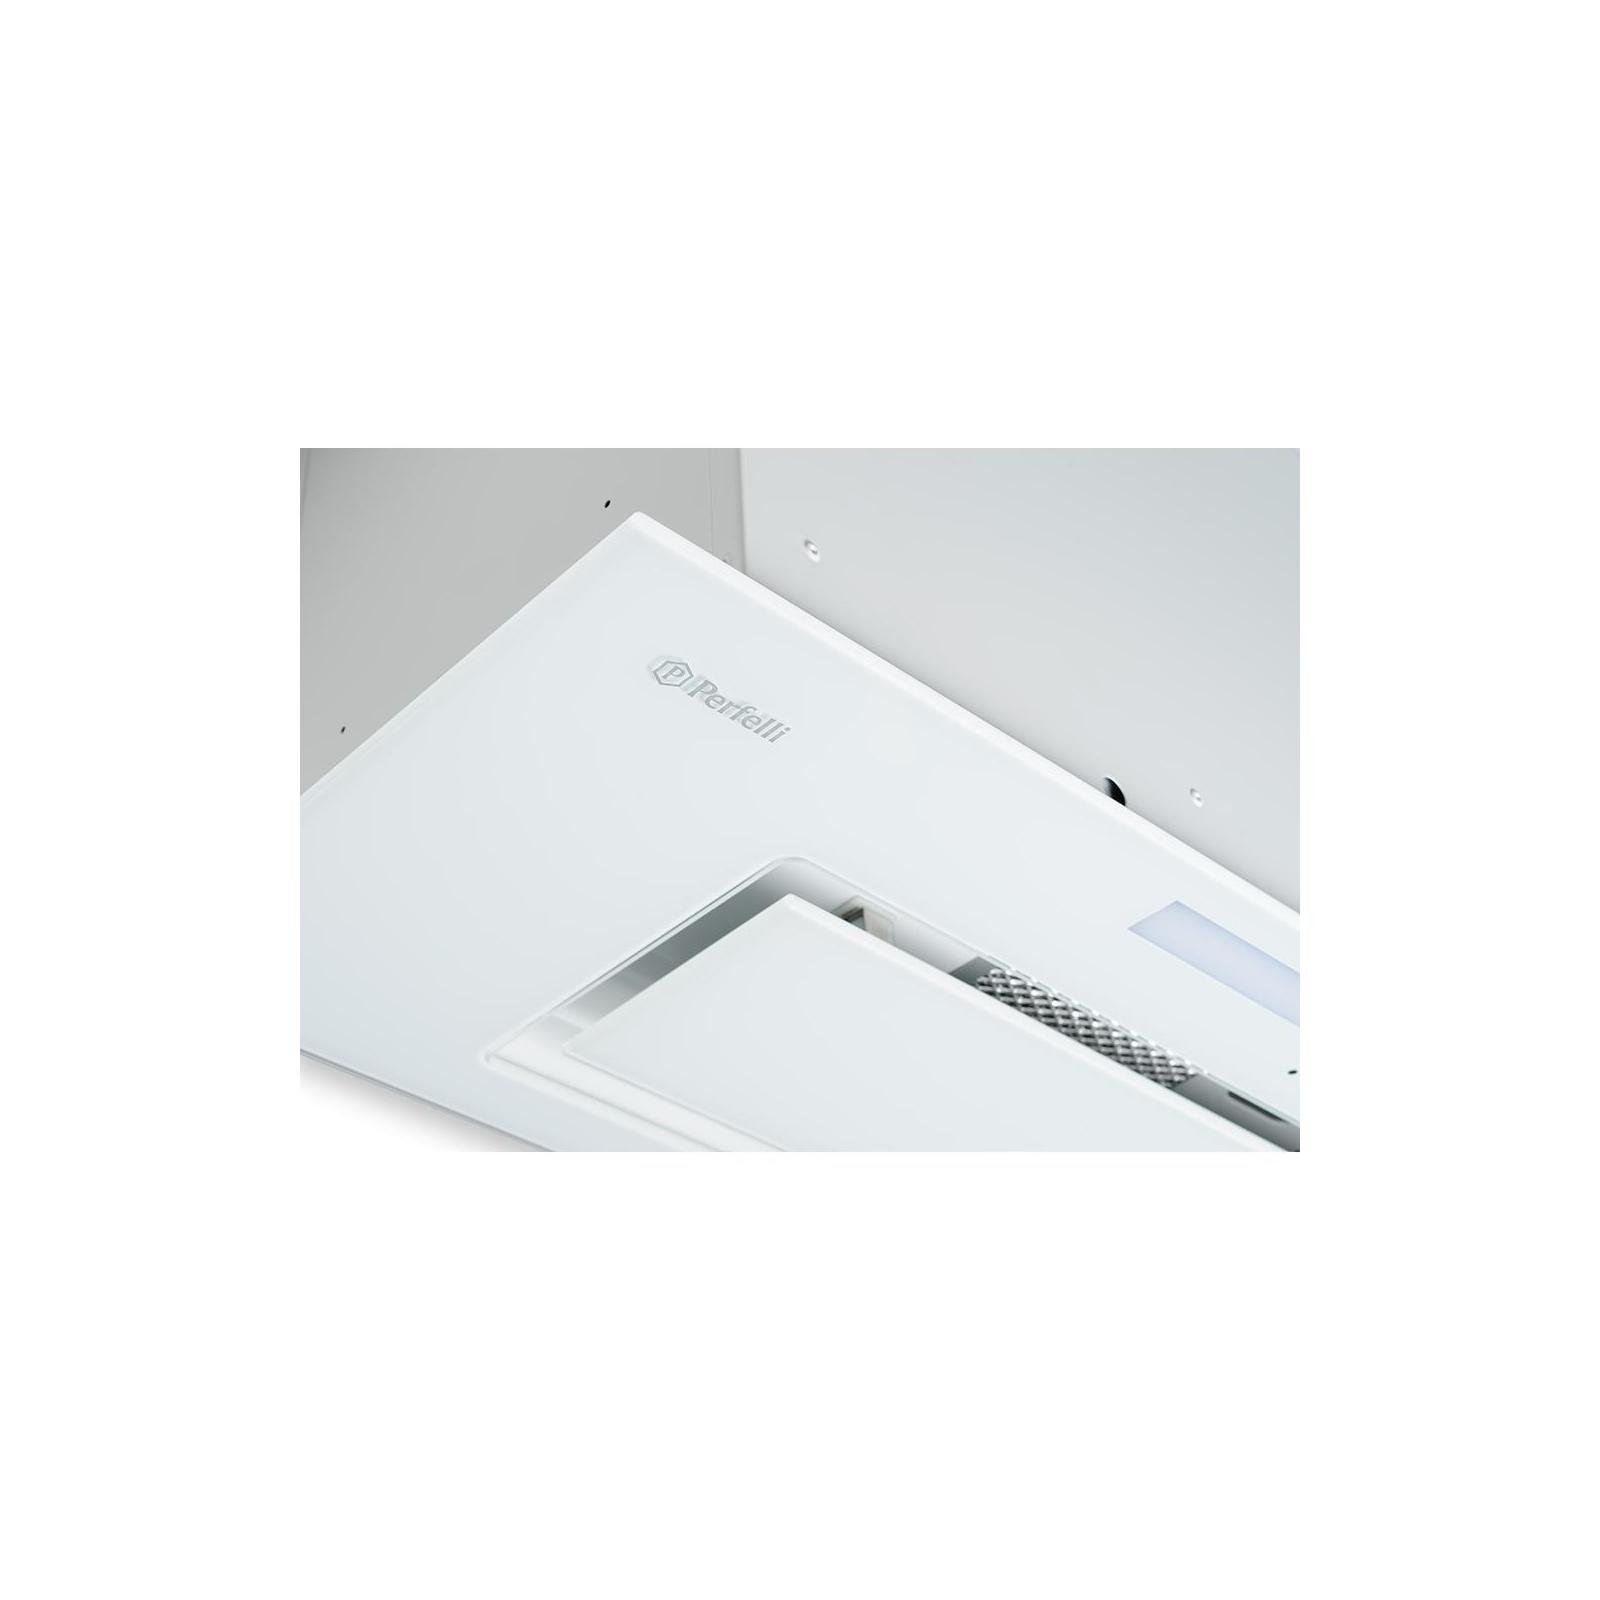 Вытяжка кухонная PERFELLI BISP 9973 A 1250 W LED Strip изображение 6